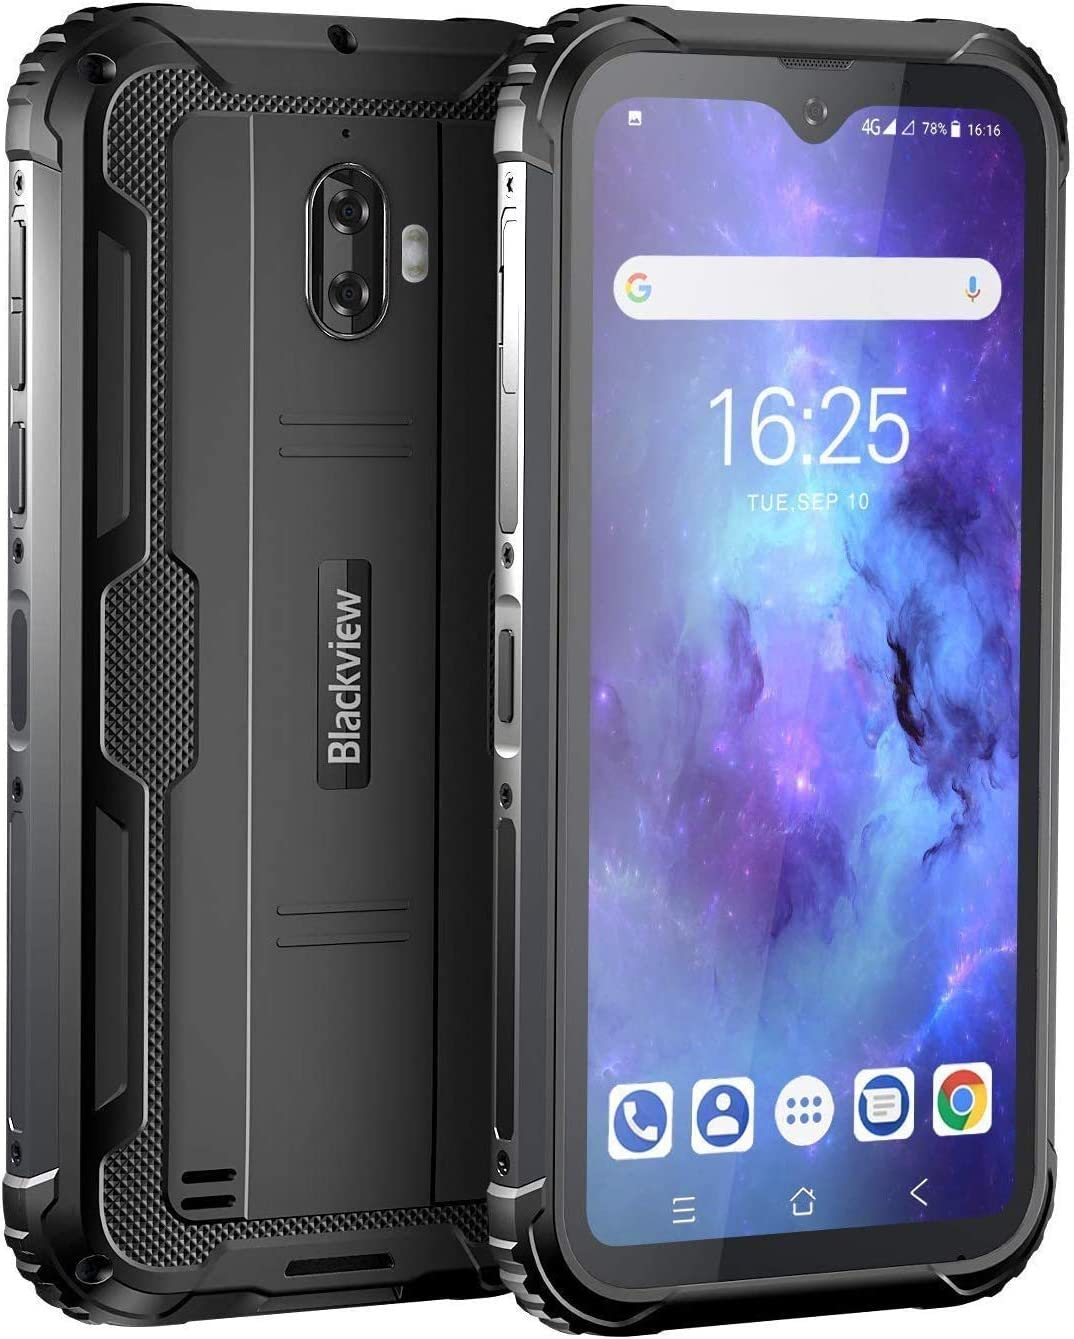 Movil Resistente, Blackview BV5900 Telefono Movil Antigolpes, 5.7 Pulgadas HD+ Display, 4G Android 9.0, Batería 5580mAh, 3GB RAM+32GB ROM, IP68 Impermeable Smartphone, Cámara 13MP+5MP, GPS/NFC-Negro